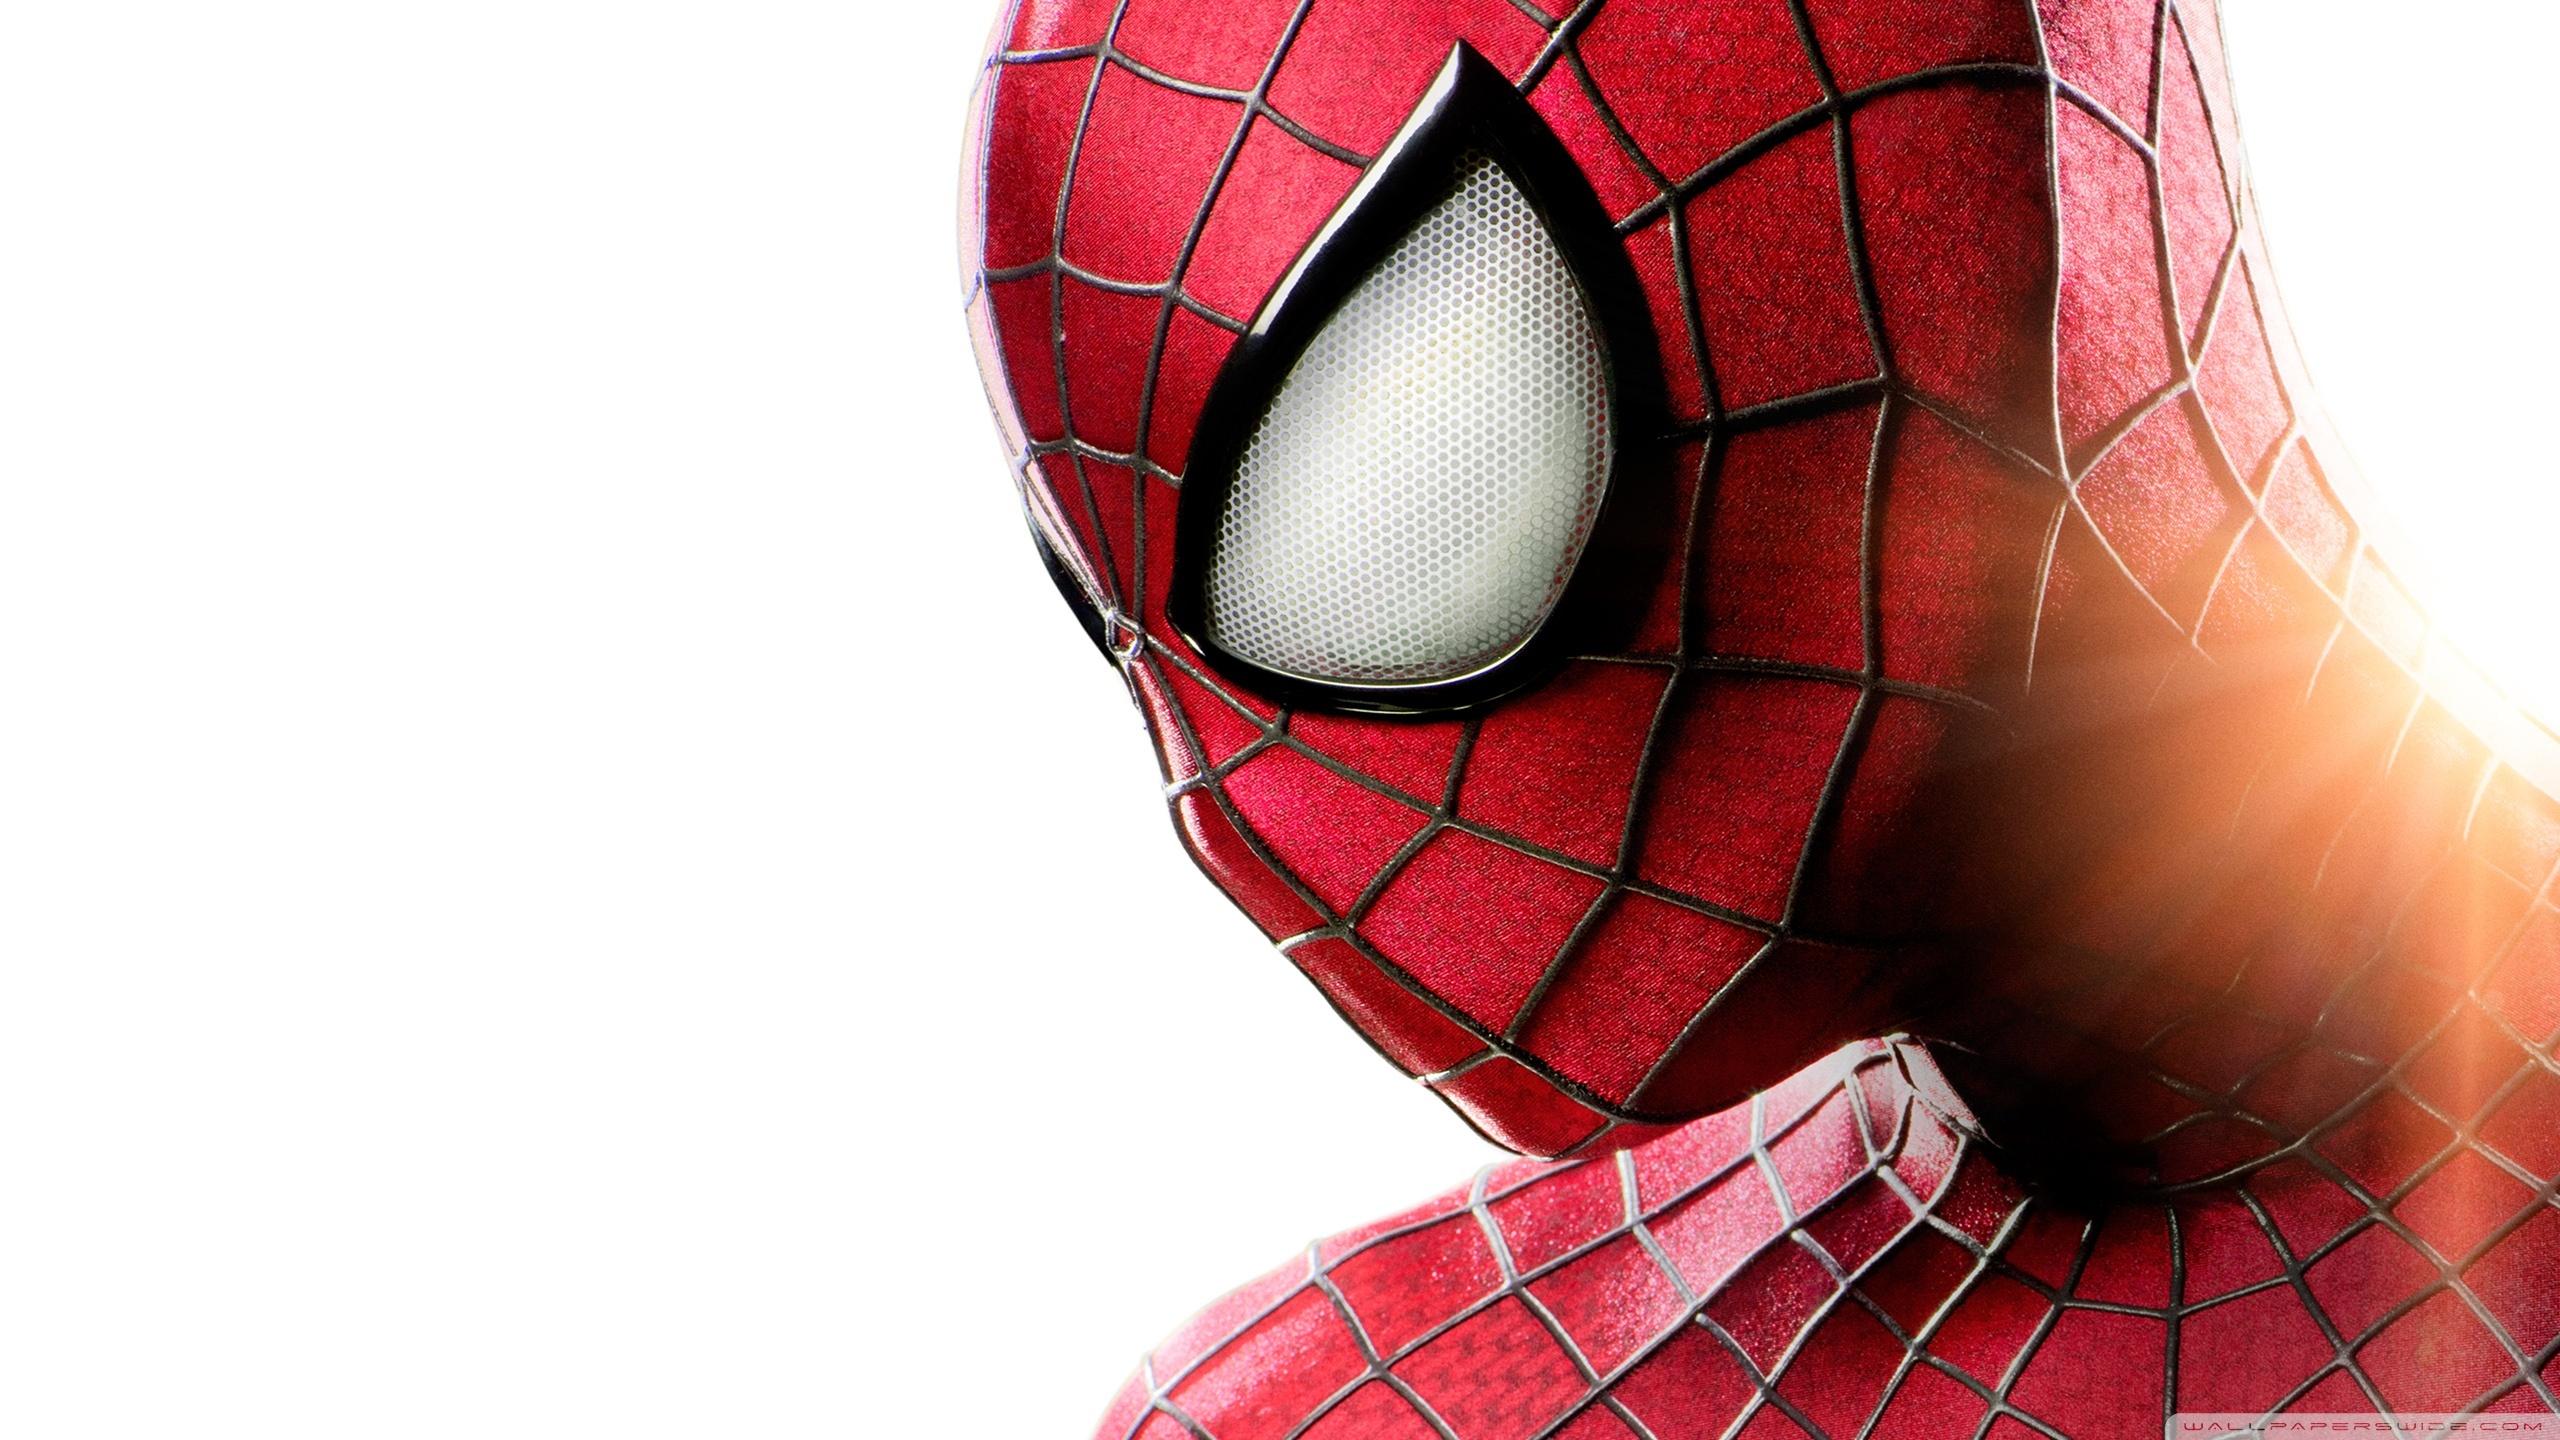 the_amazing_spider_man_9-wallpaper-2560x1440.jpg